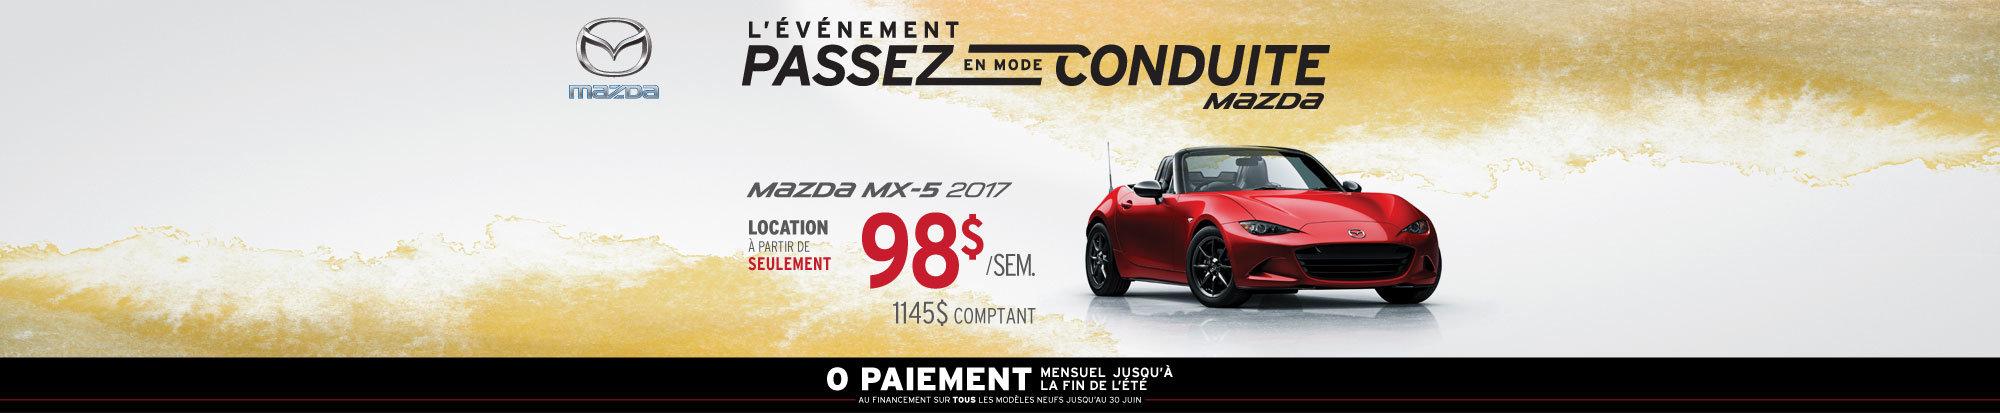 Louez la Mazda MX-5 2017 (web)